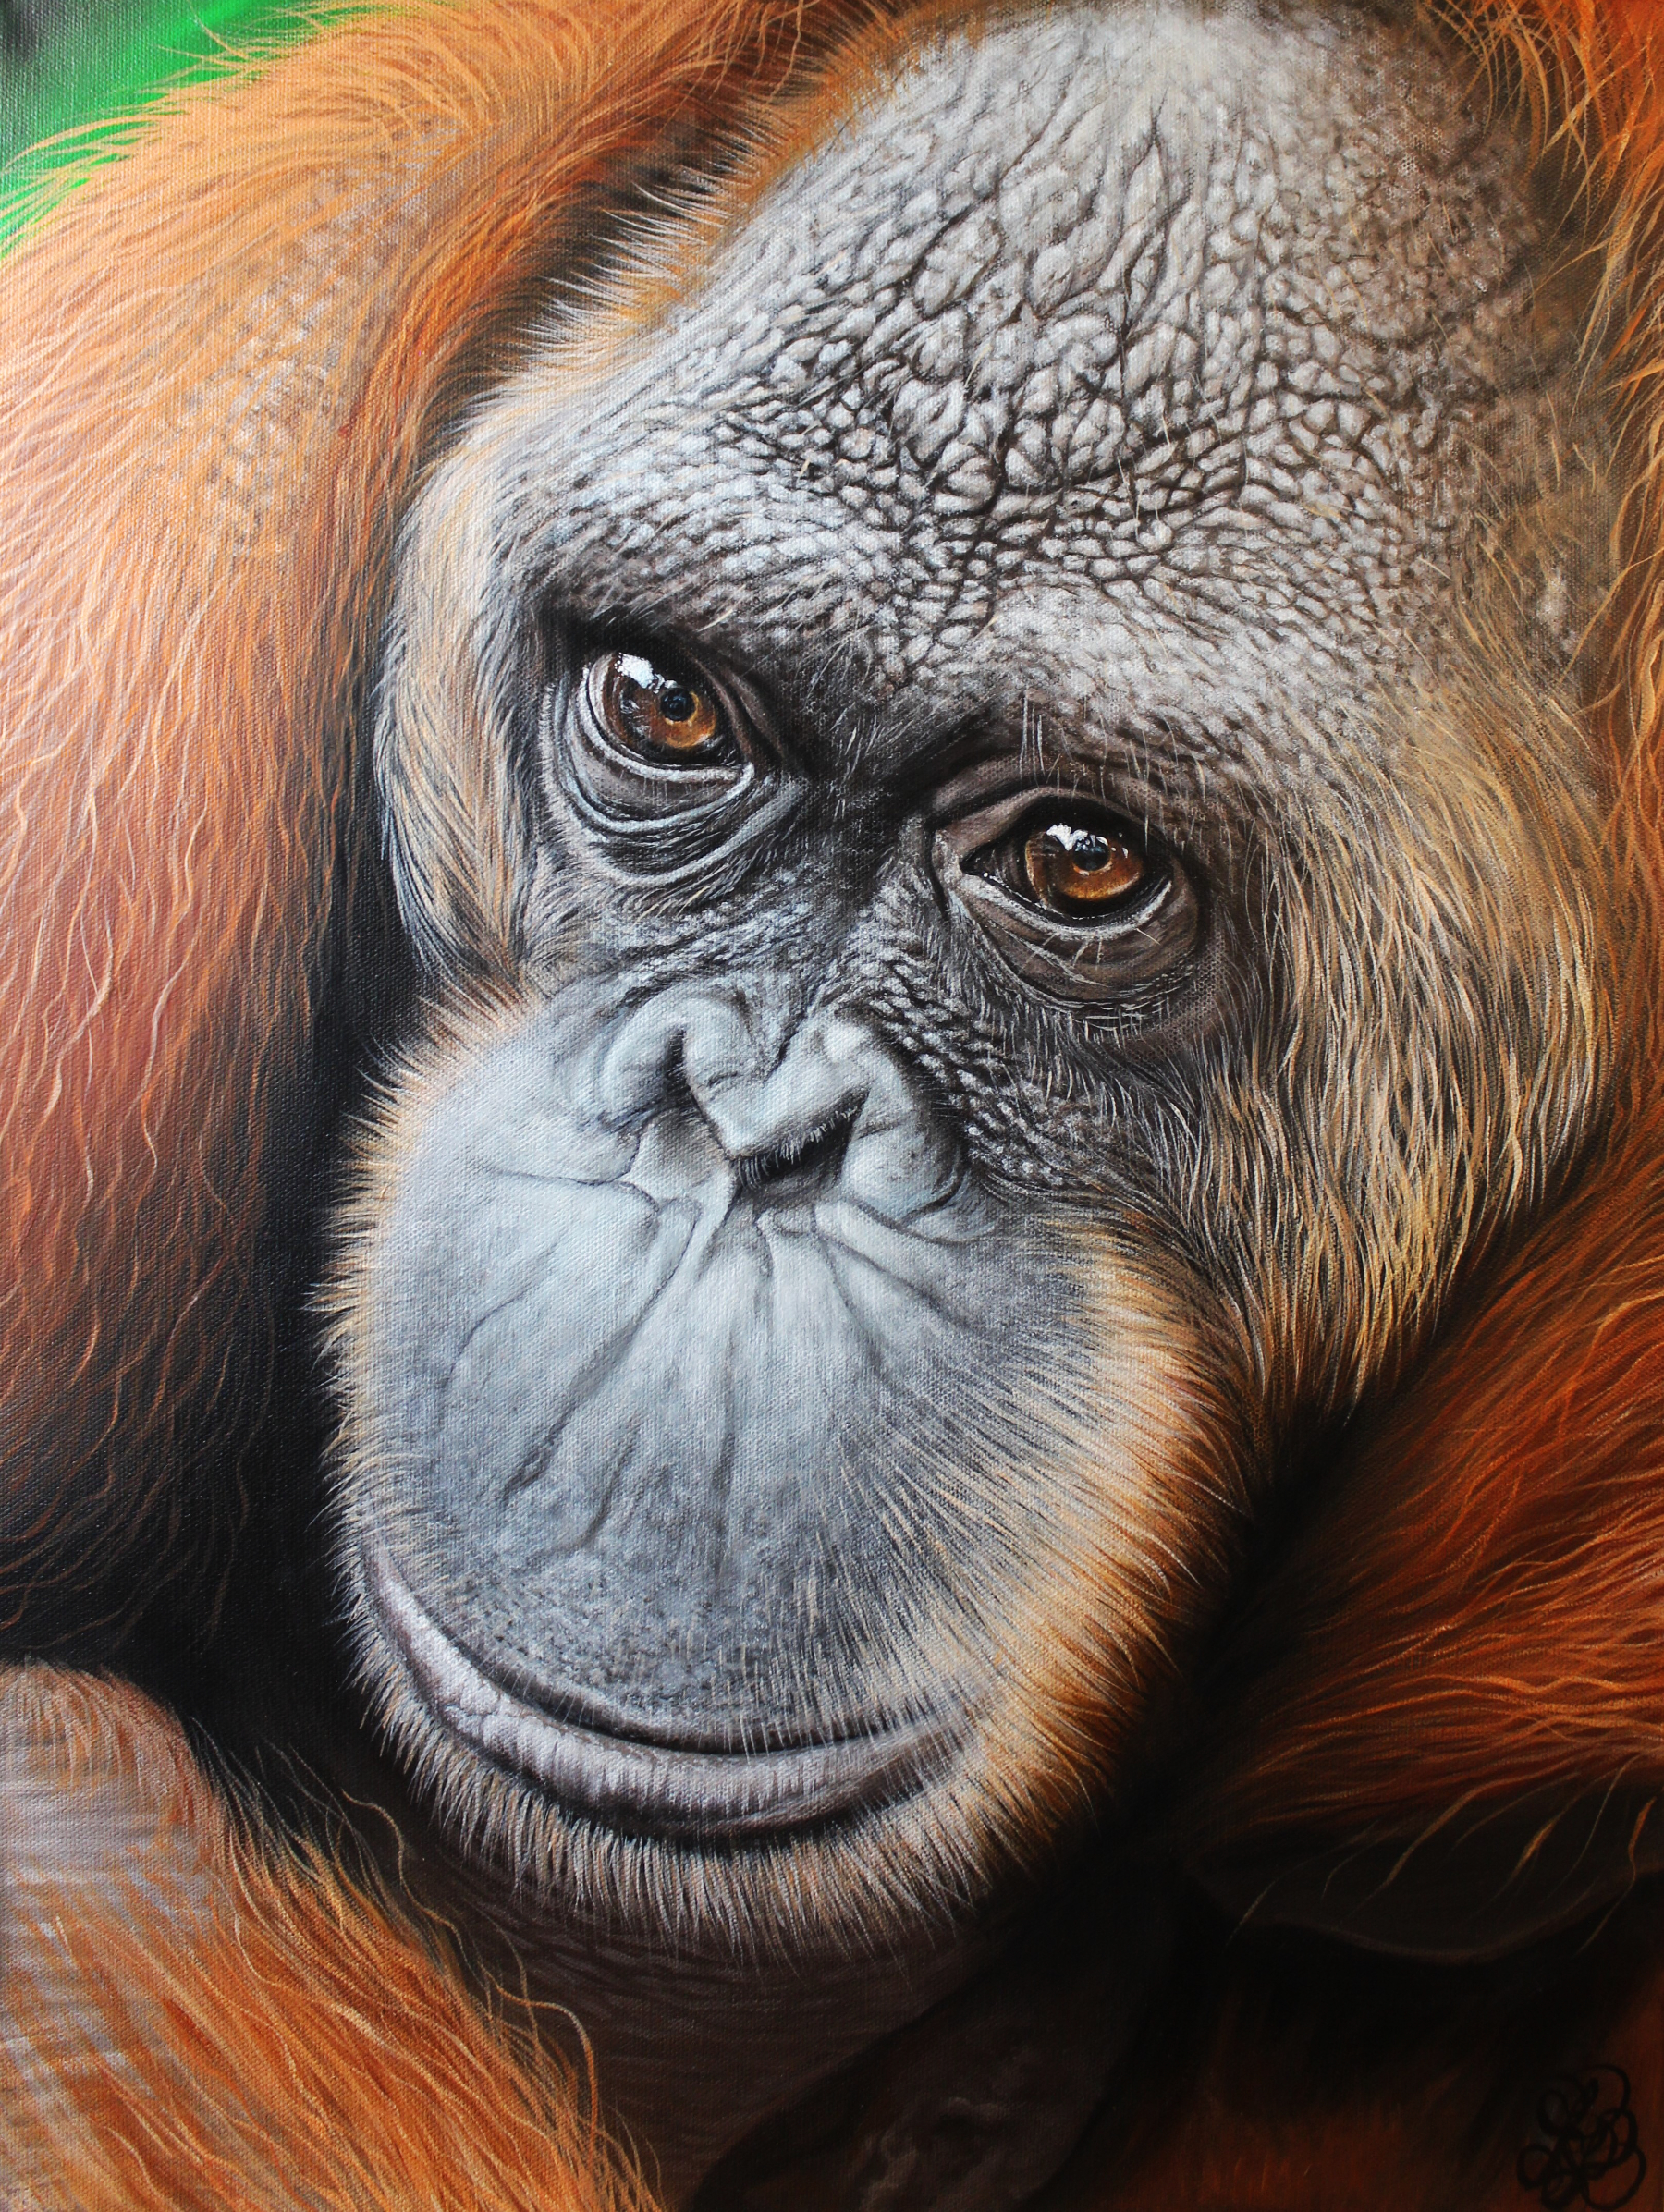 Peanut Orangutan Painting Rephotographed